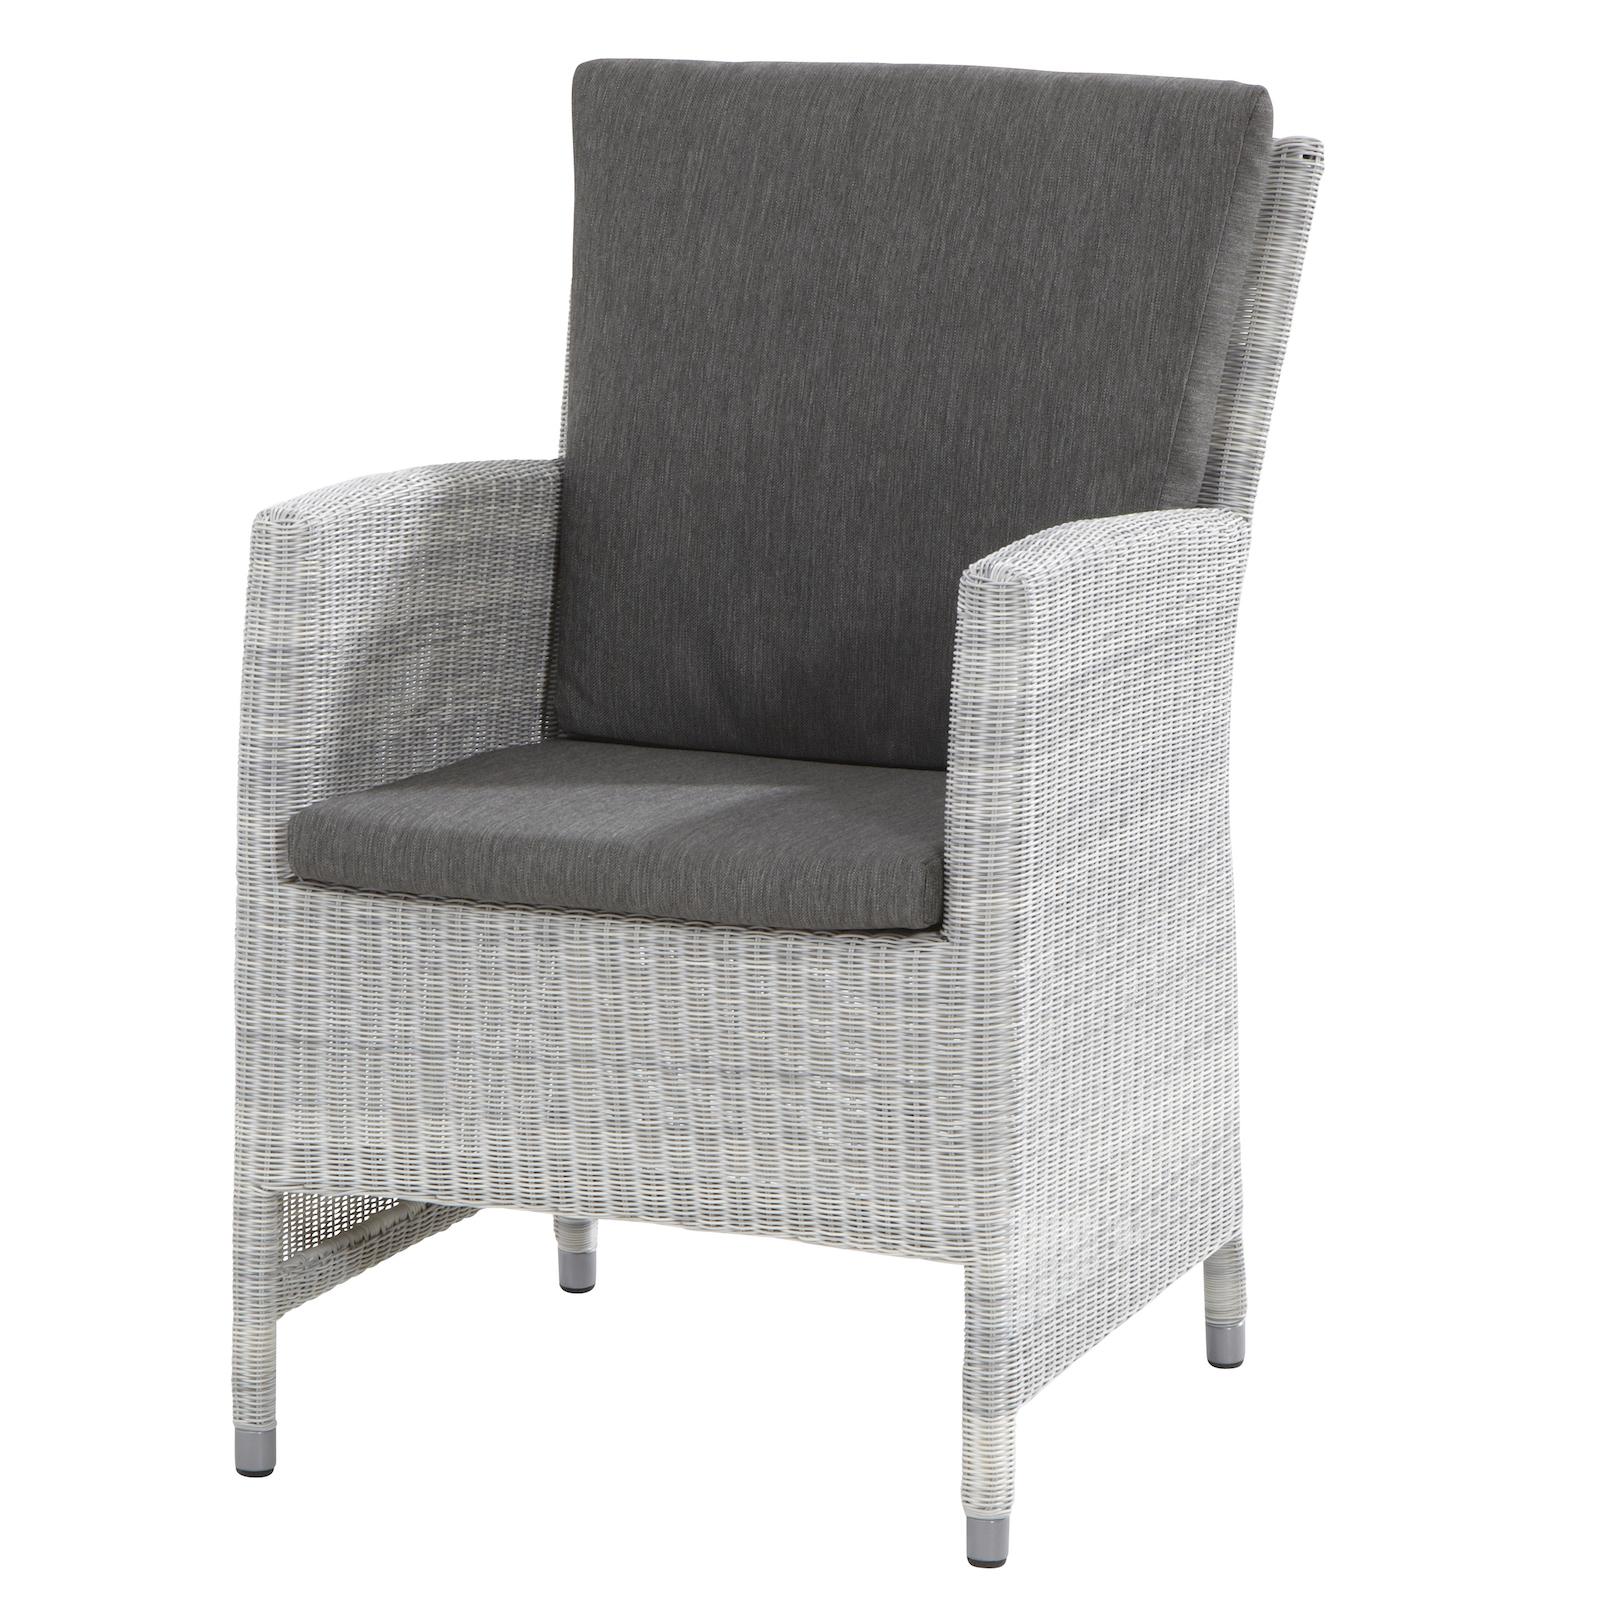 beautiful outdoor sessel polyrattan photos house design. Black Bedroom Furniture Sets. Home Design Ideas